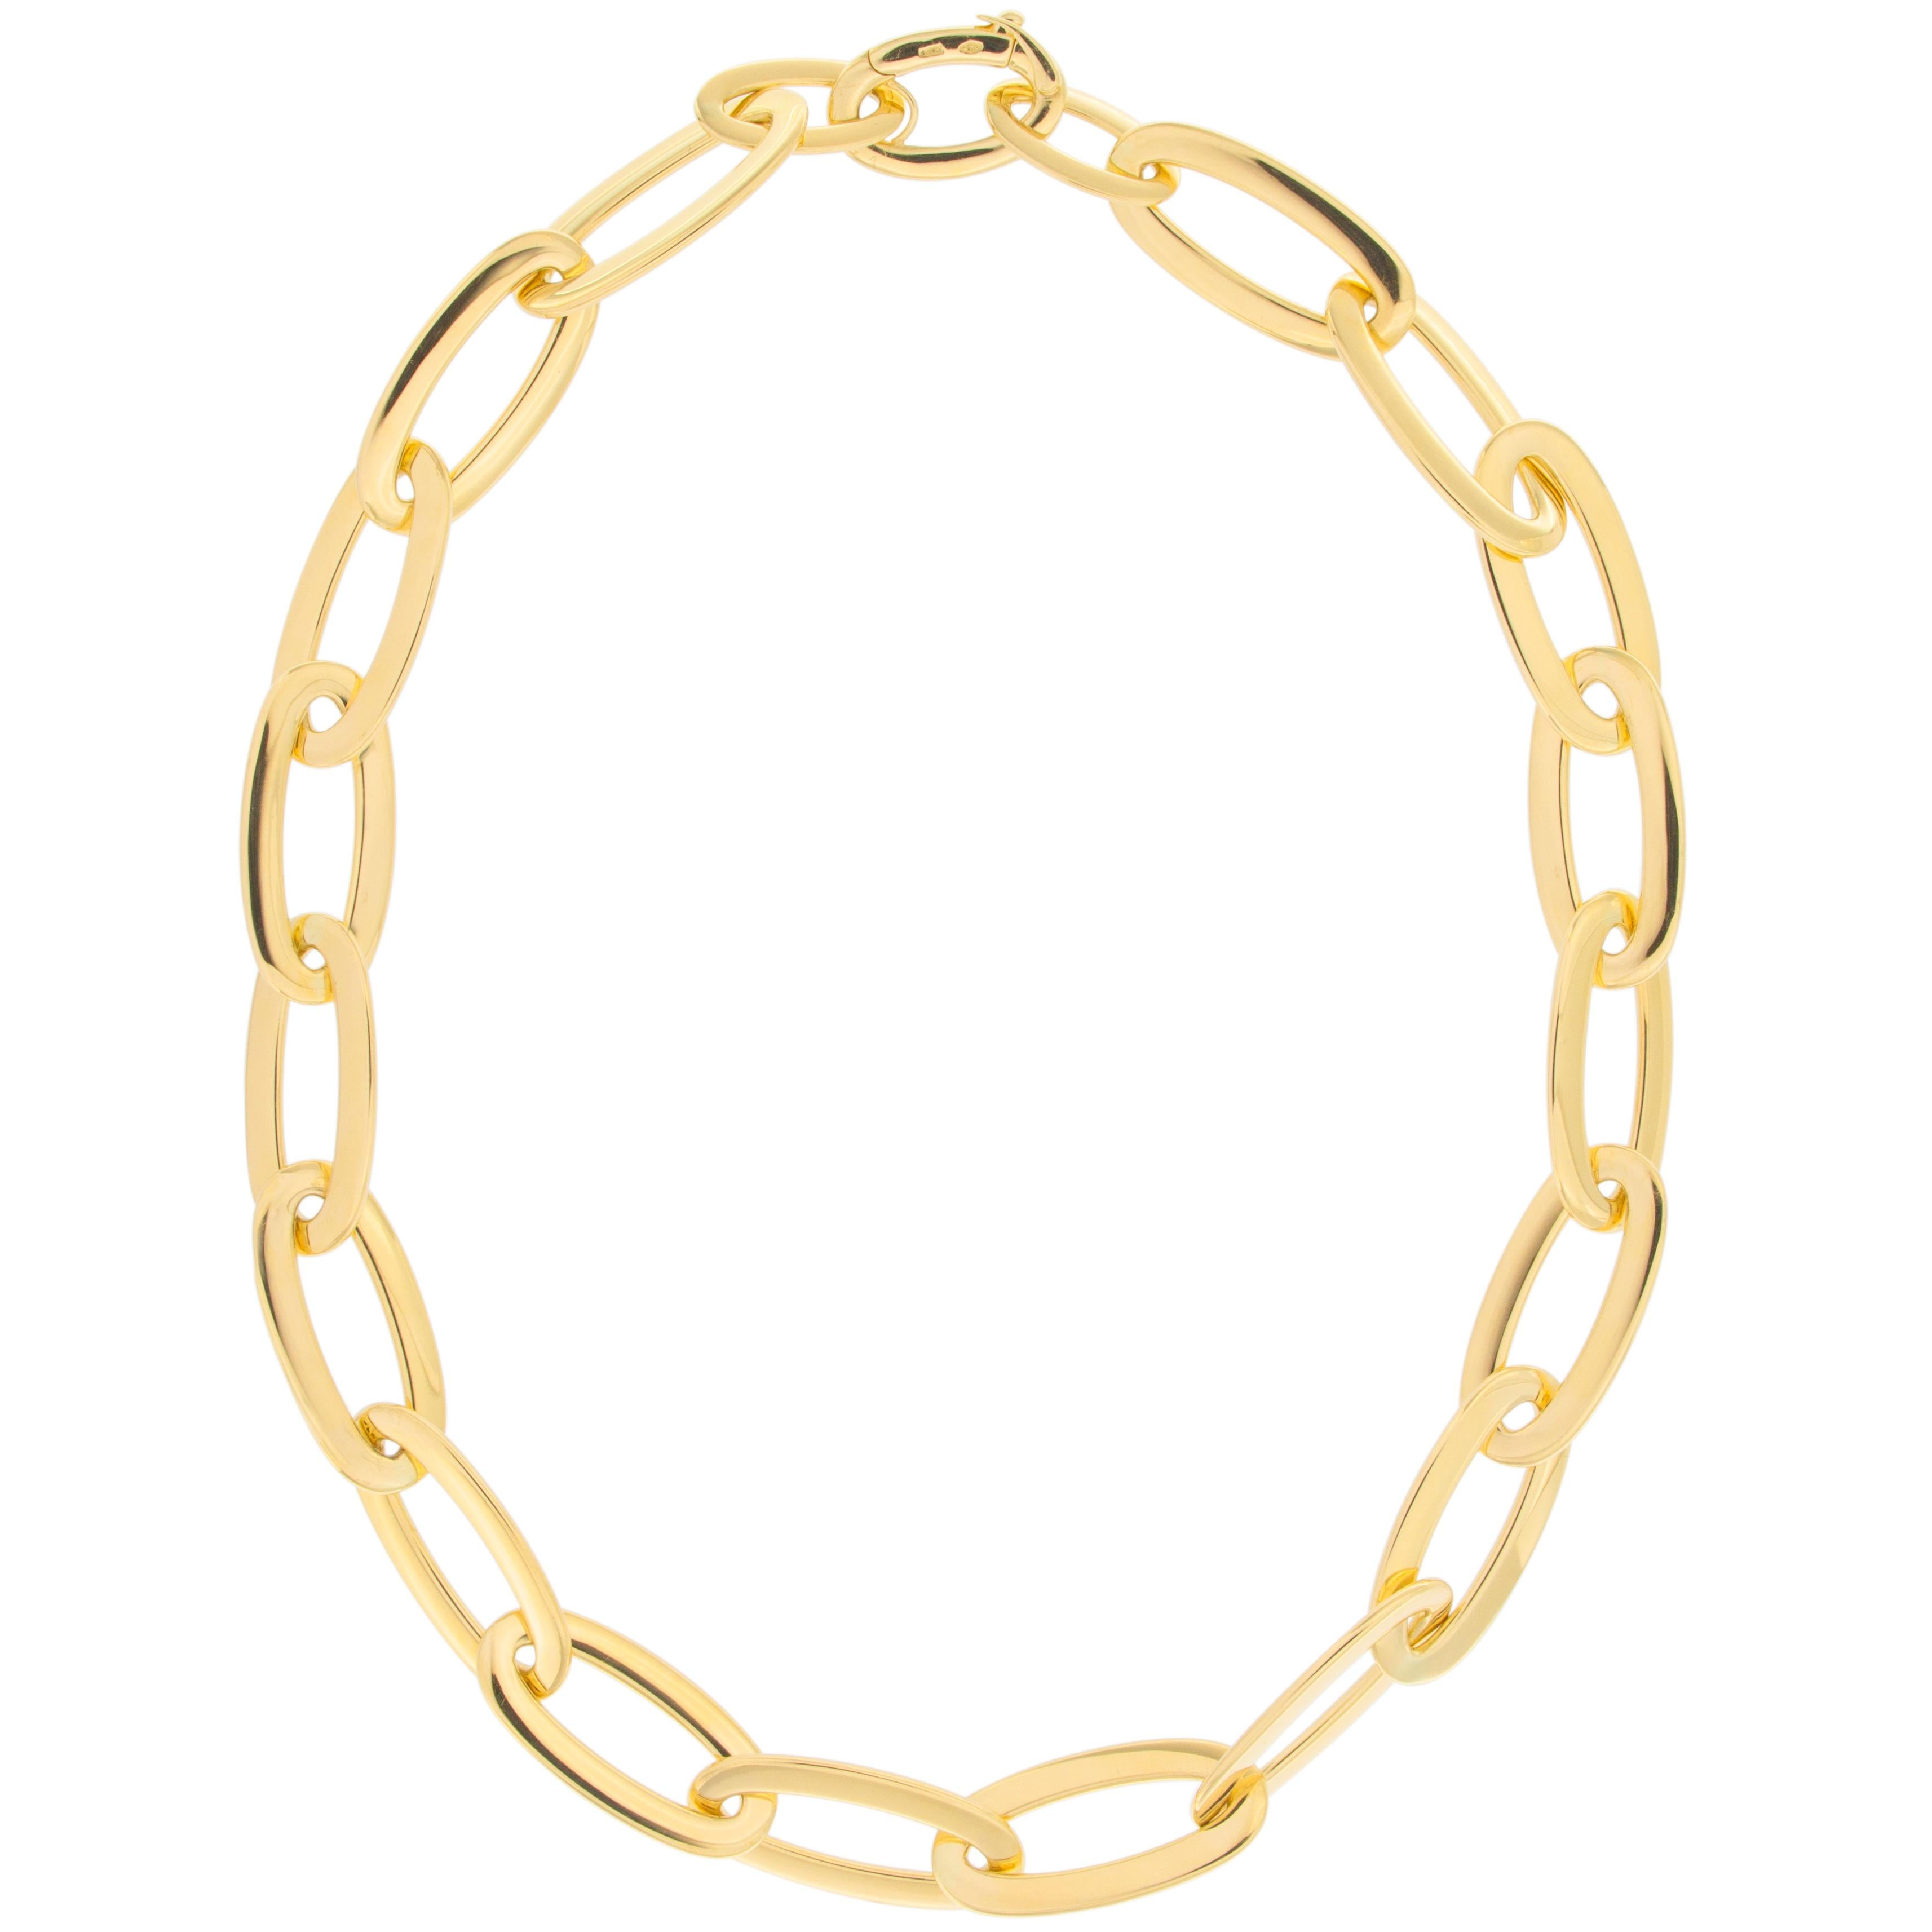 Jona 18 Karat Yellow Gold Link Chain Necklace